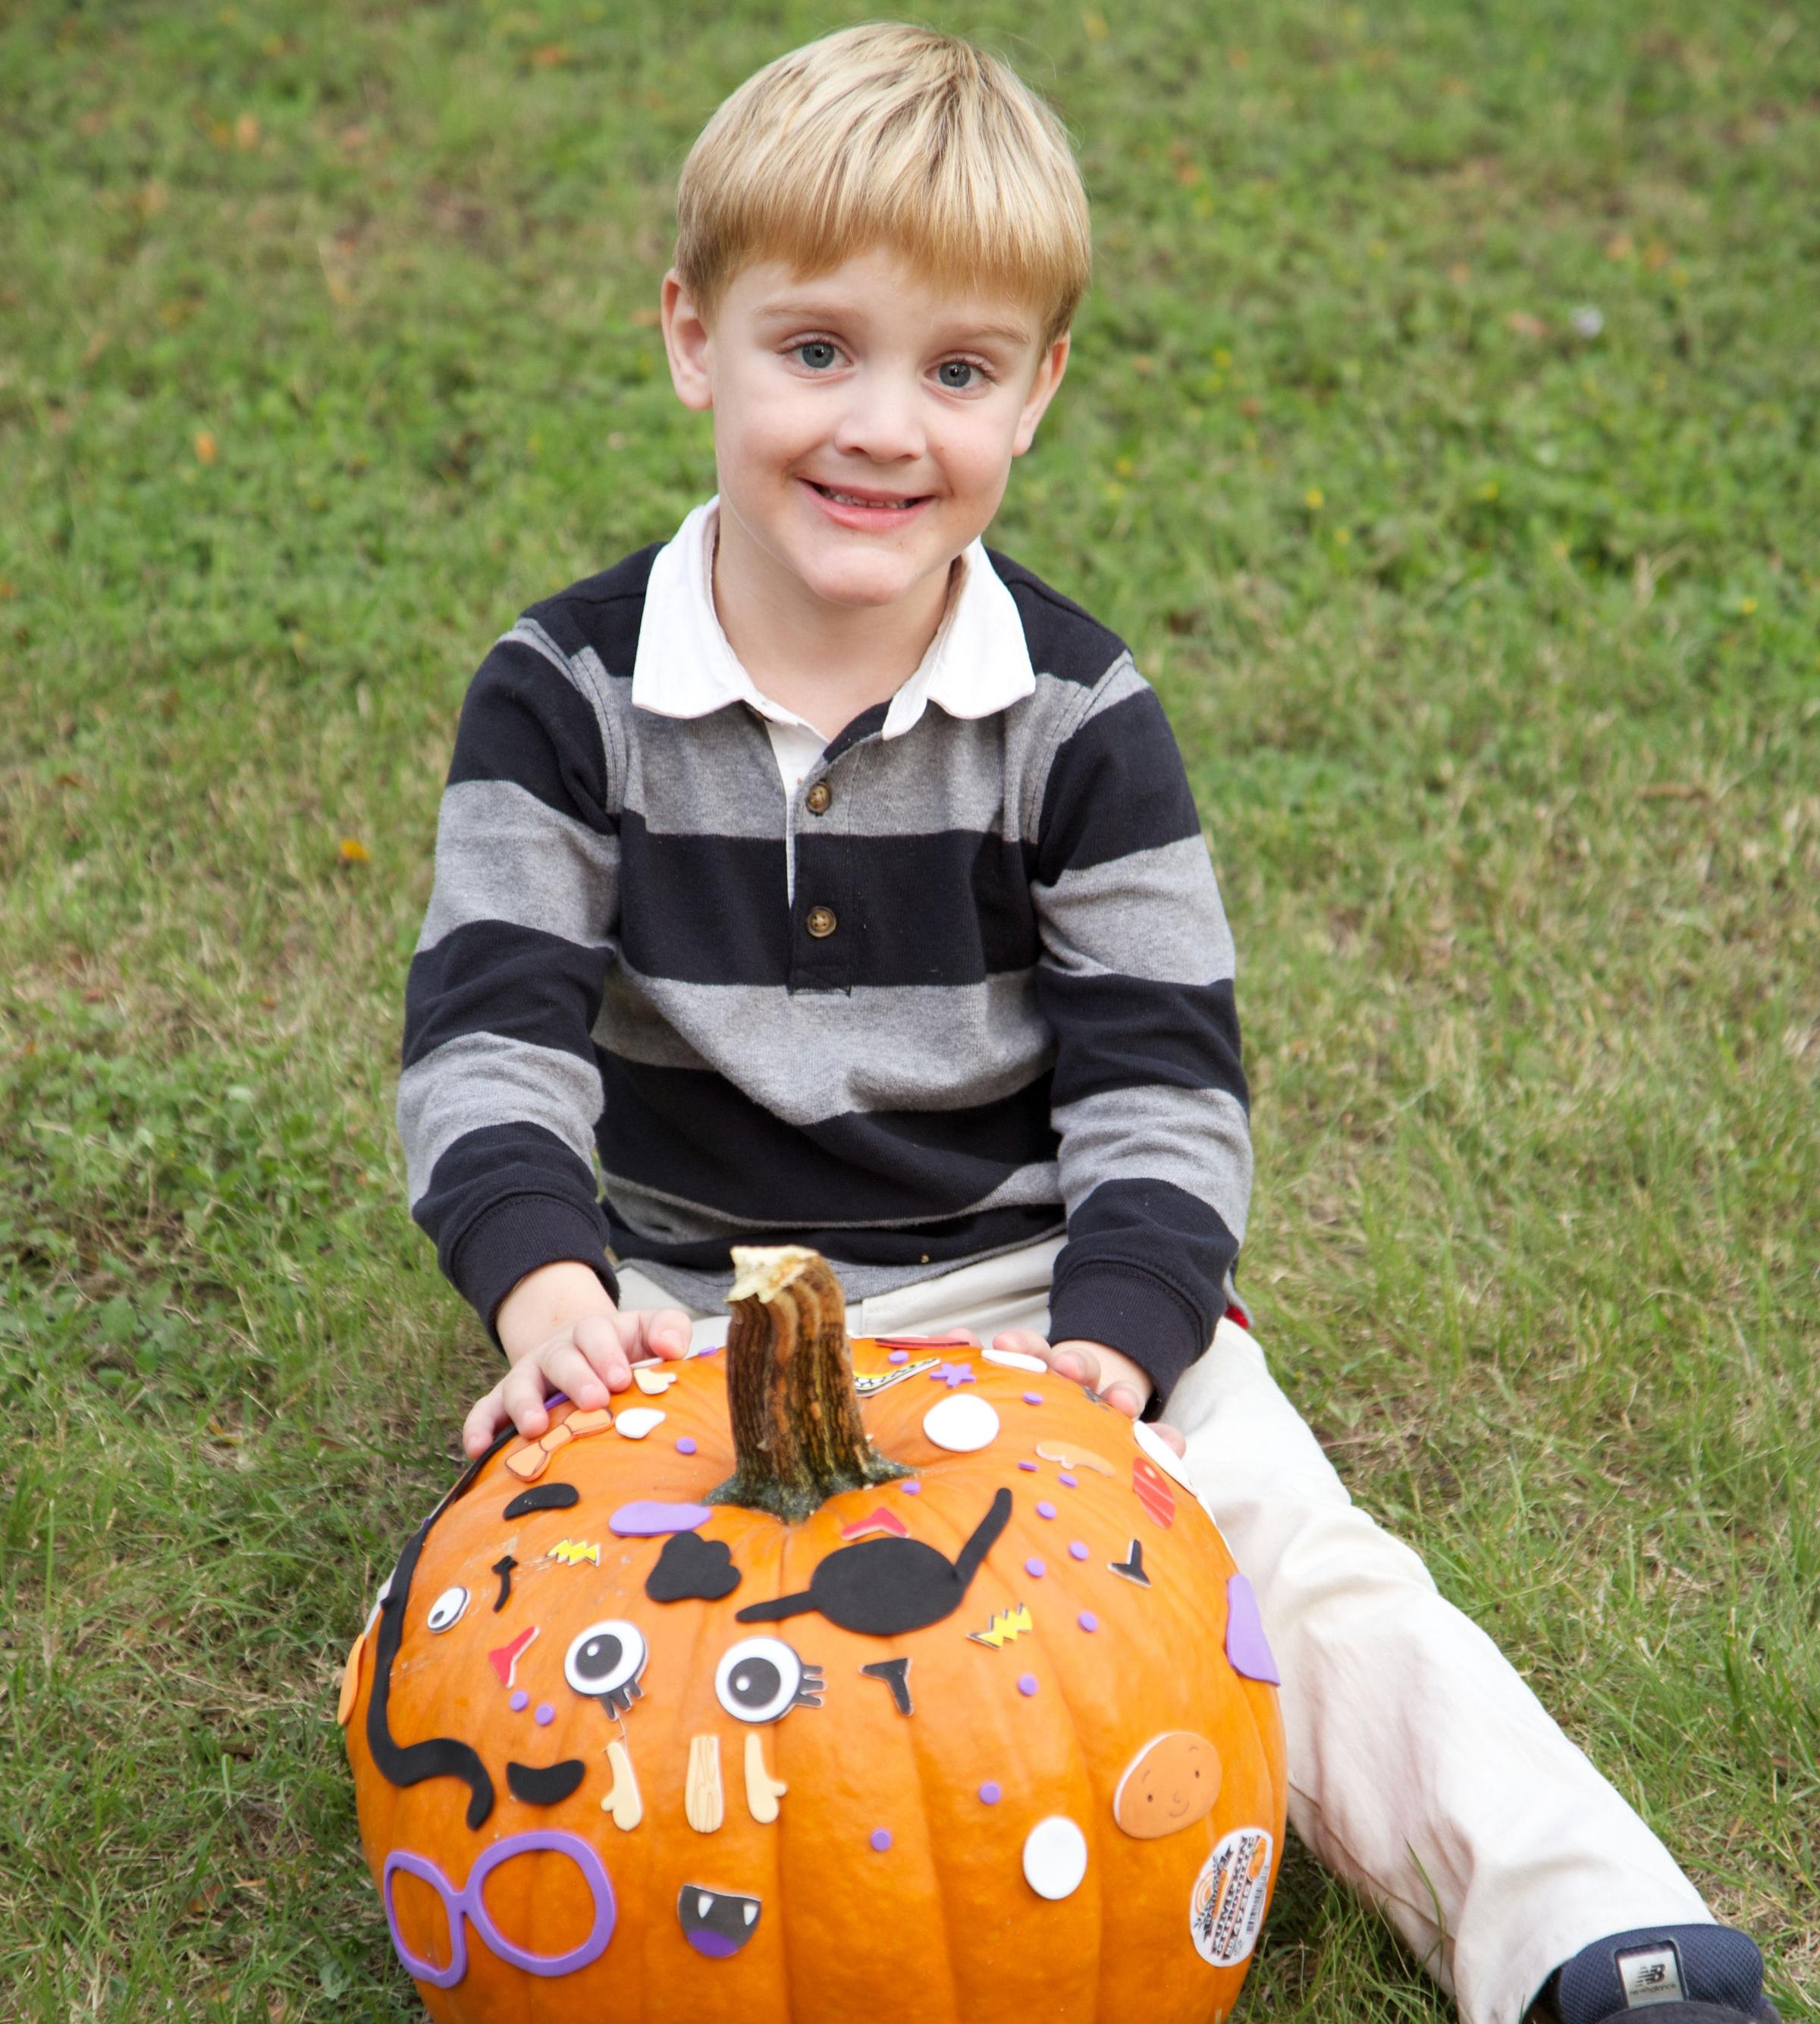 Pumpkin Party at Tillery Park